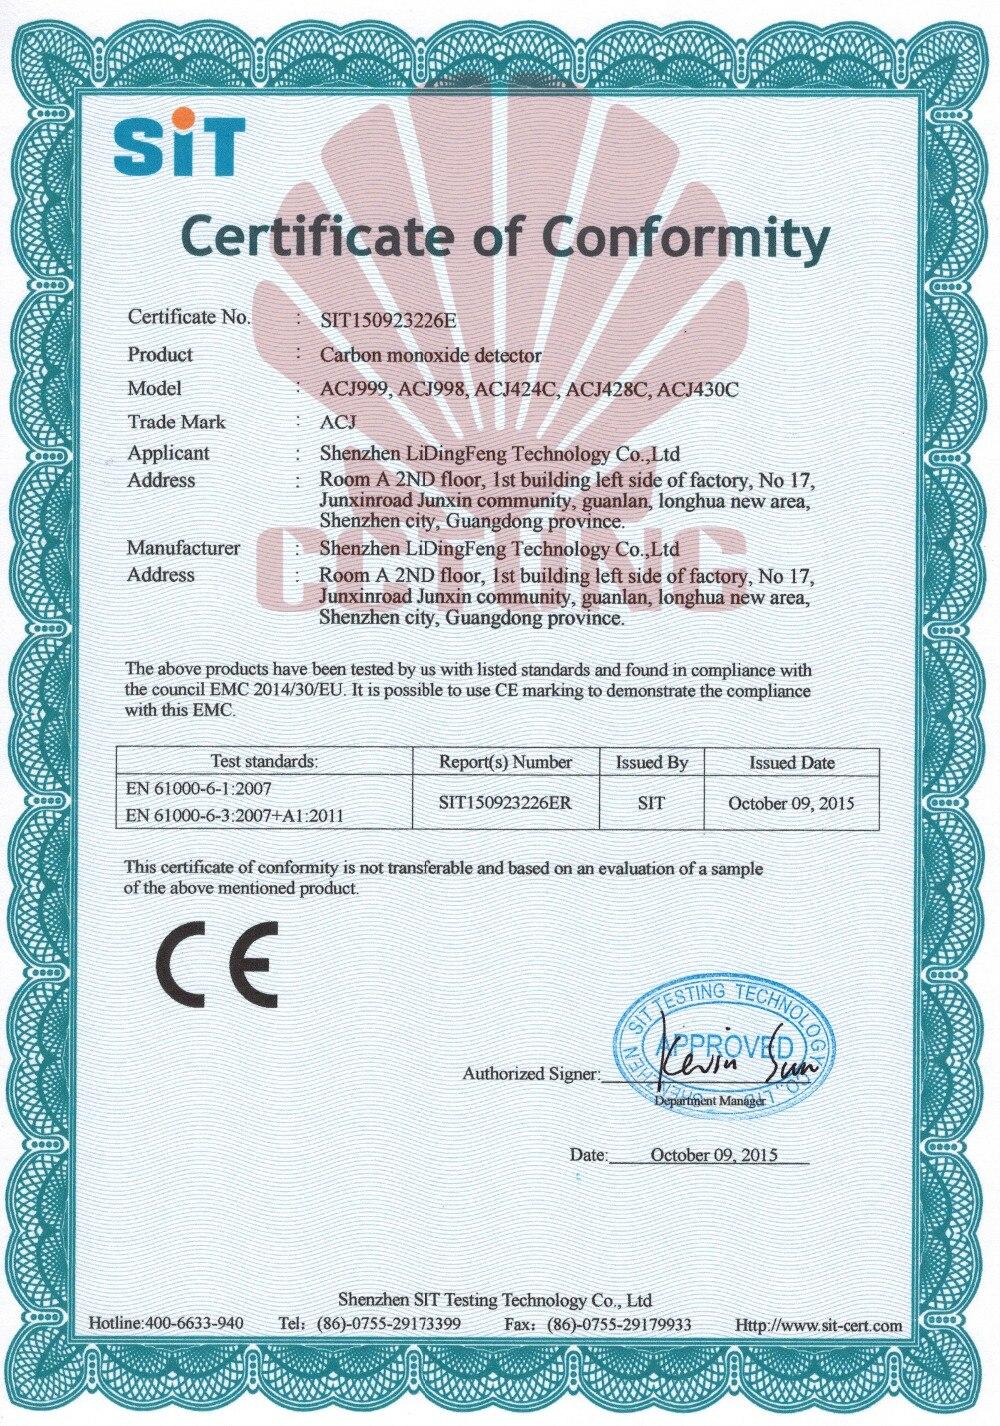 CO CE Certificates_gaitubao_com_watermark